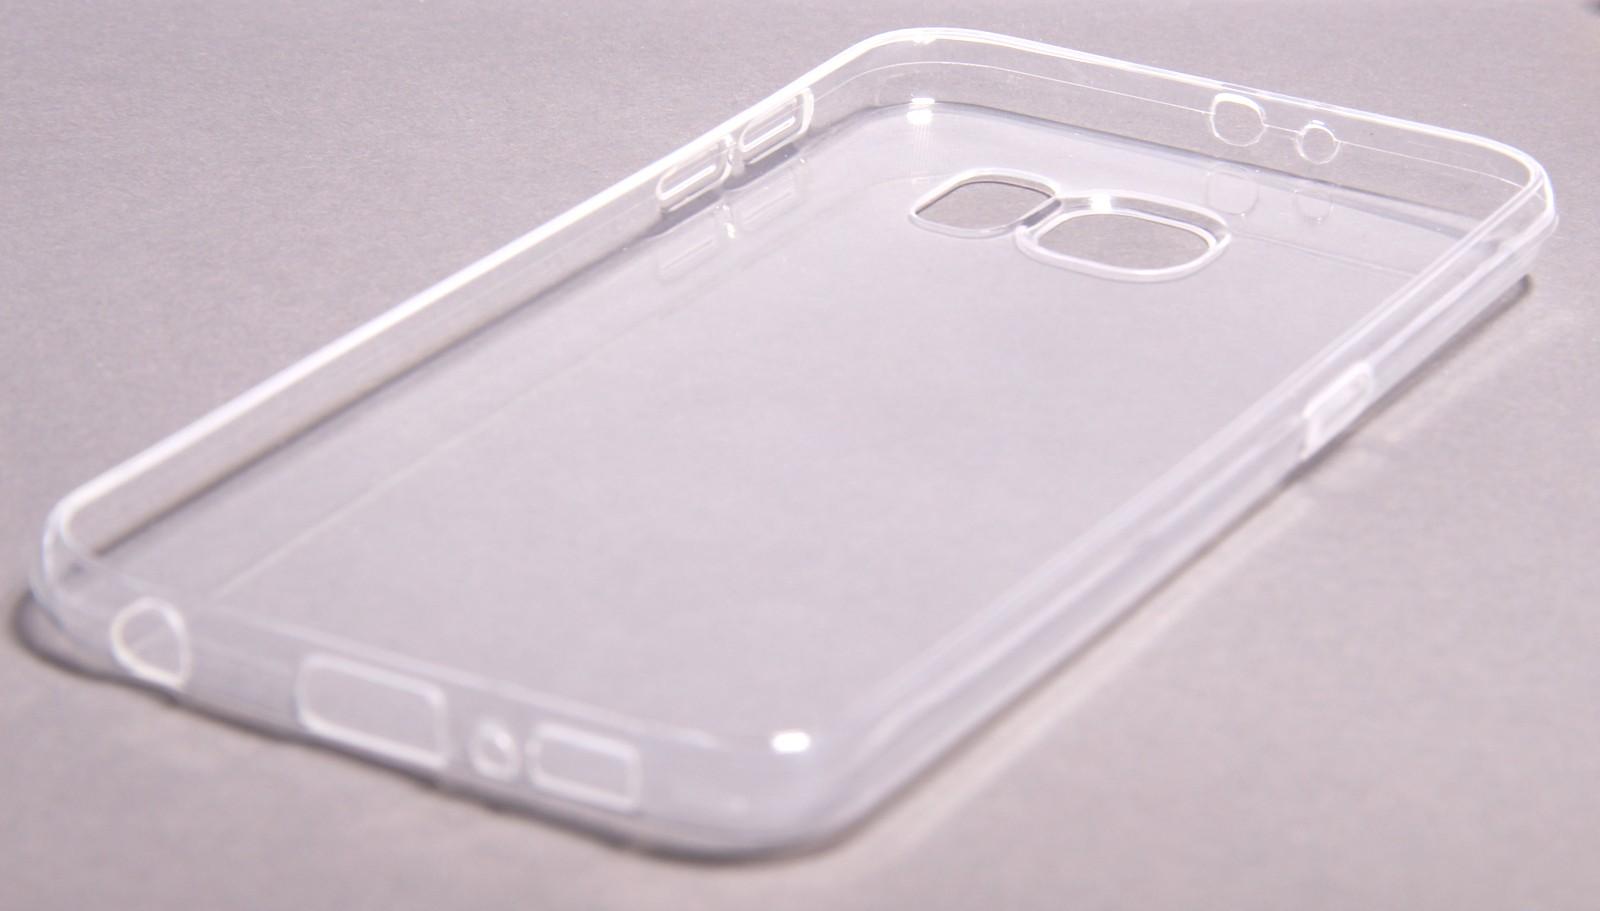 Handyhülle Schutzhülle aus Silikon HQ Premium Qualität